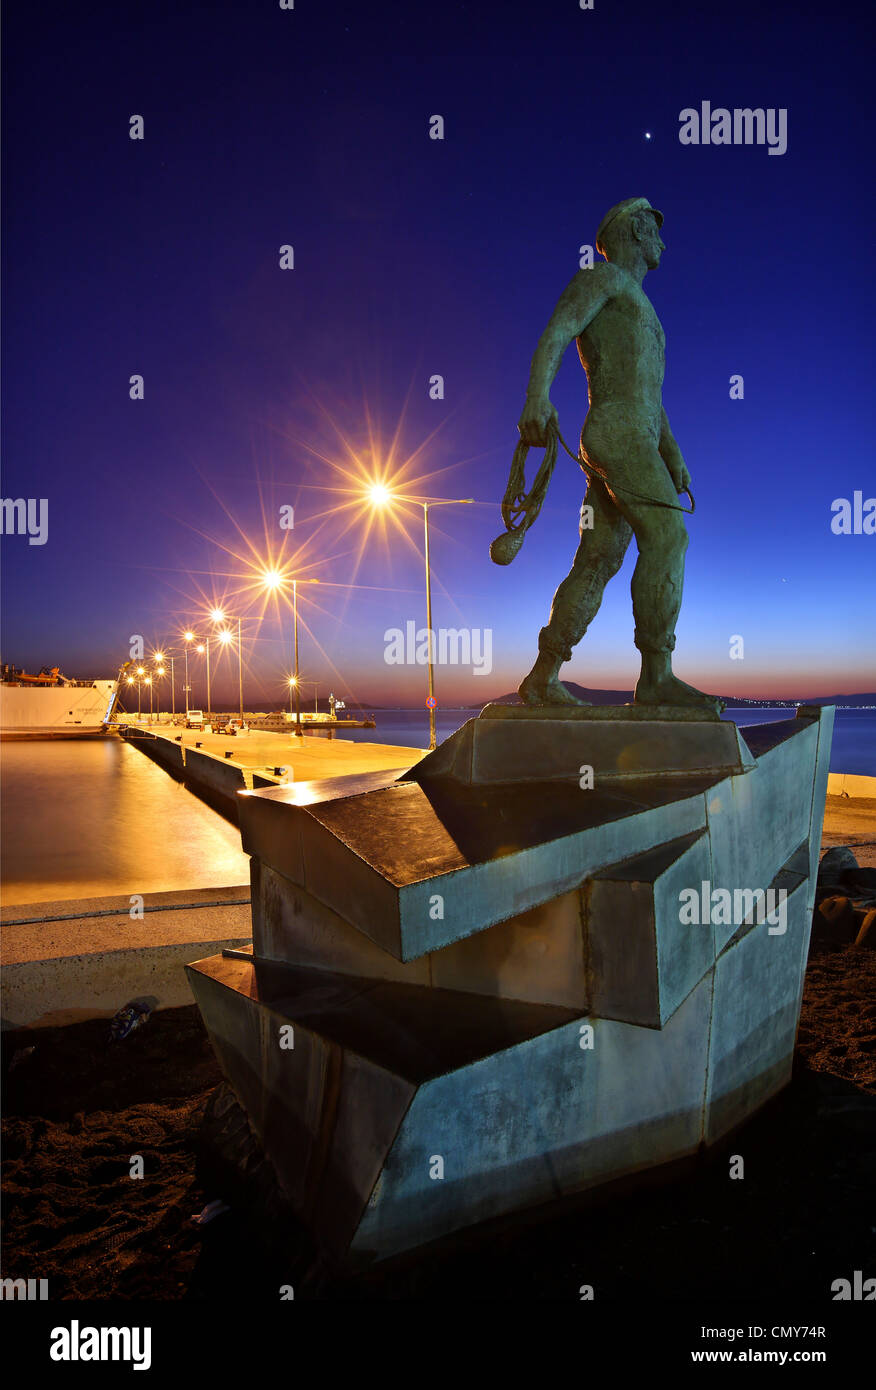 Die Statue des Seglers aus Vatika am Hafen Neapolis, Lakonia, Peloponnes, Griechenland Stockbild